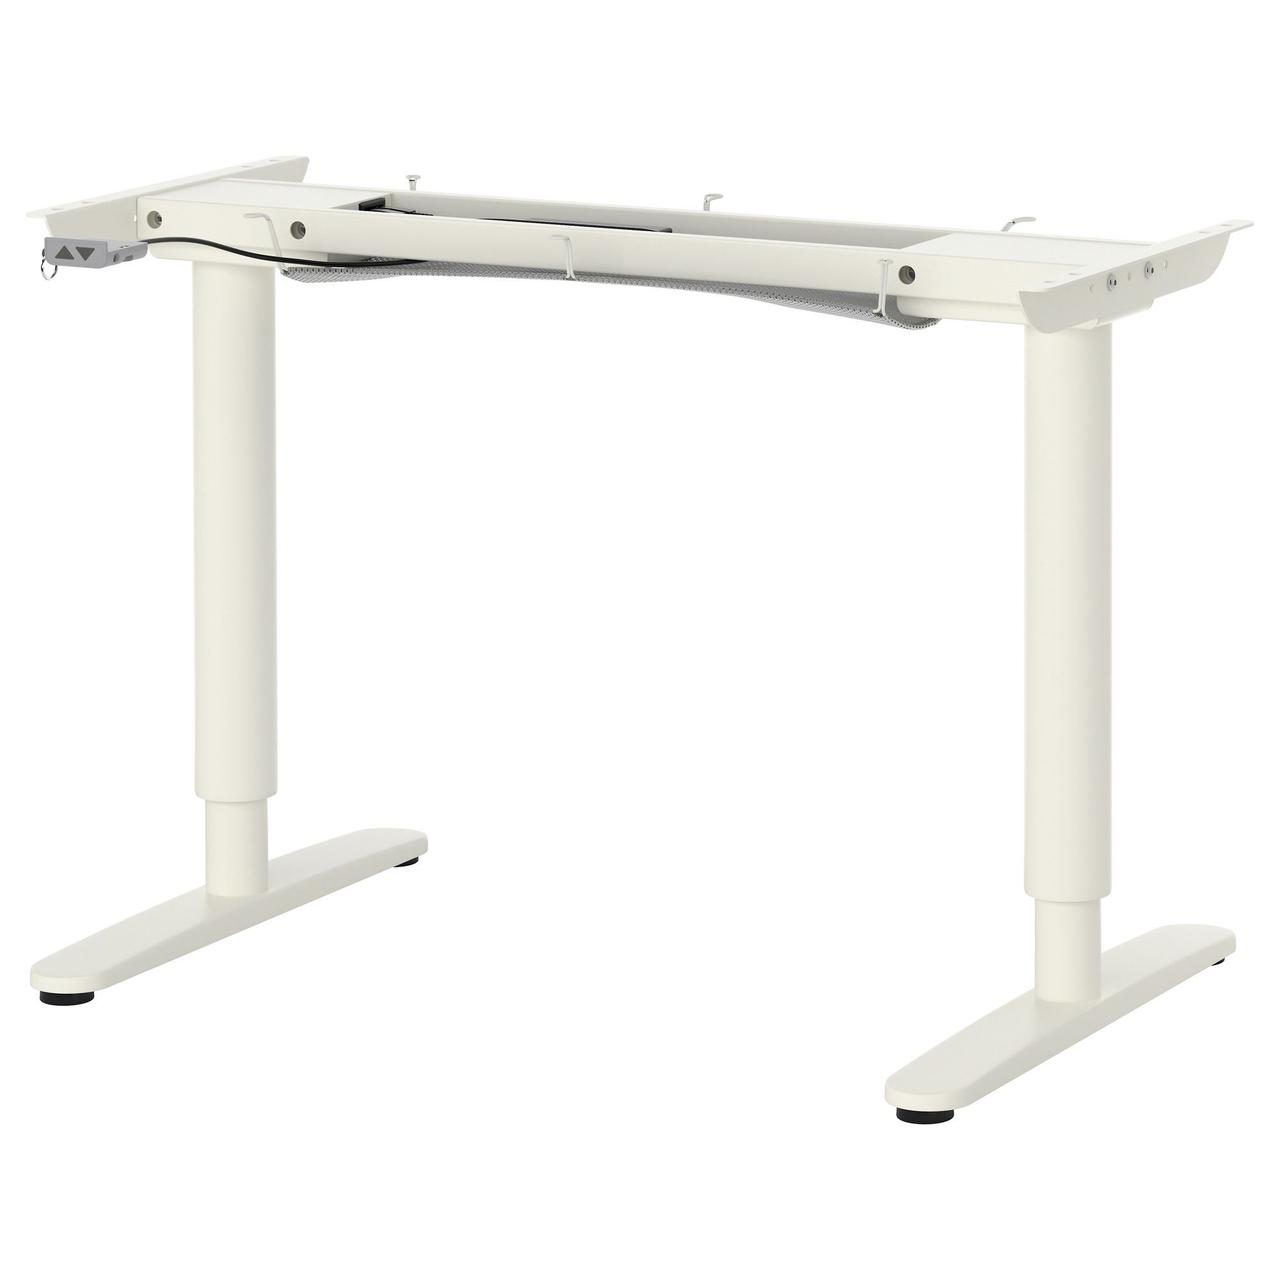 каркас для стола трансформера Ikea Bekant икеа 90255252 цена 15 892